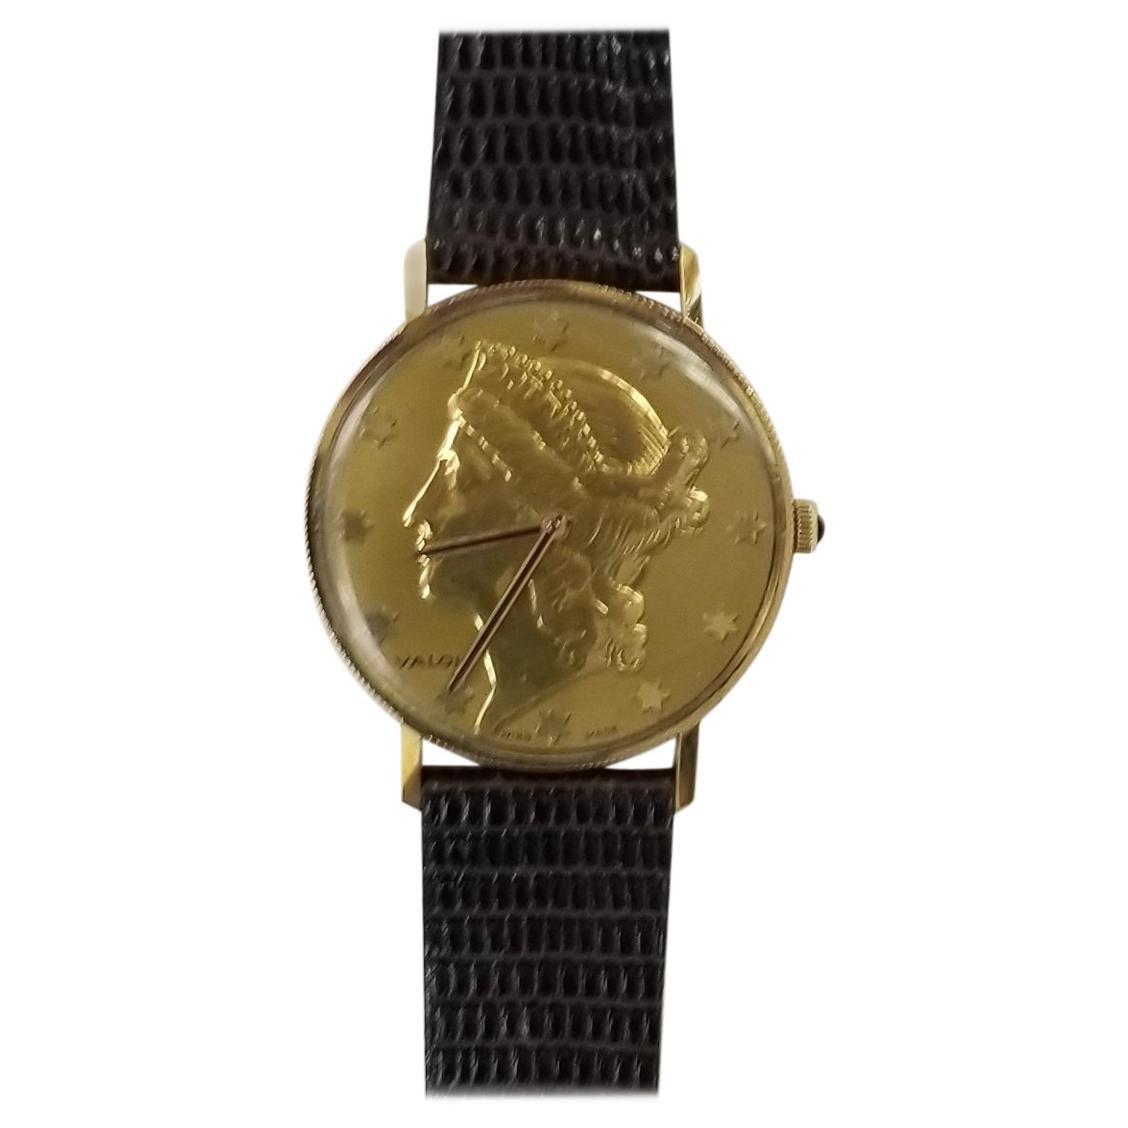 "14 Karat Solid Yellow Gold ""Valois"" Liberty Coin Face Watch"